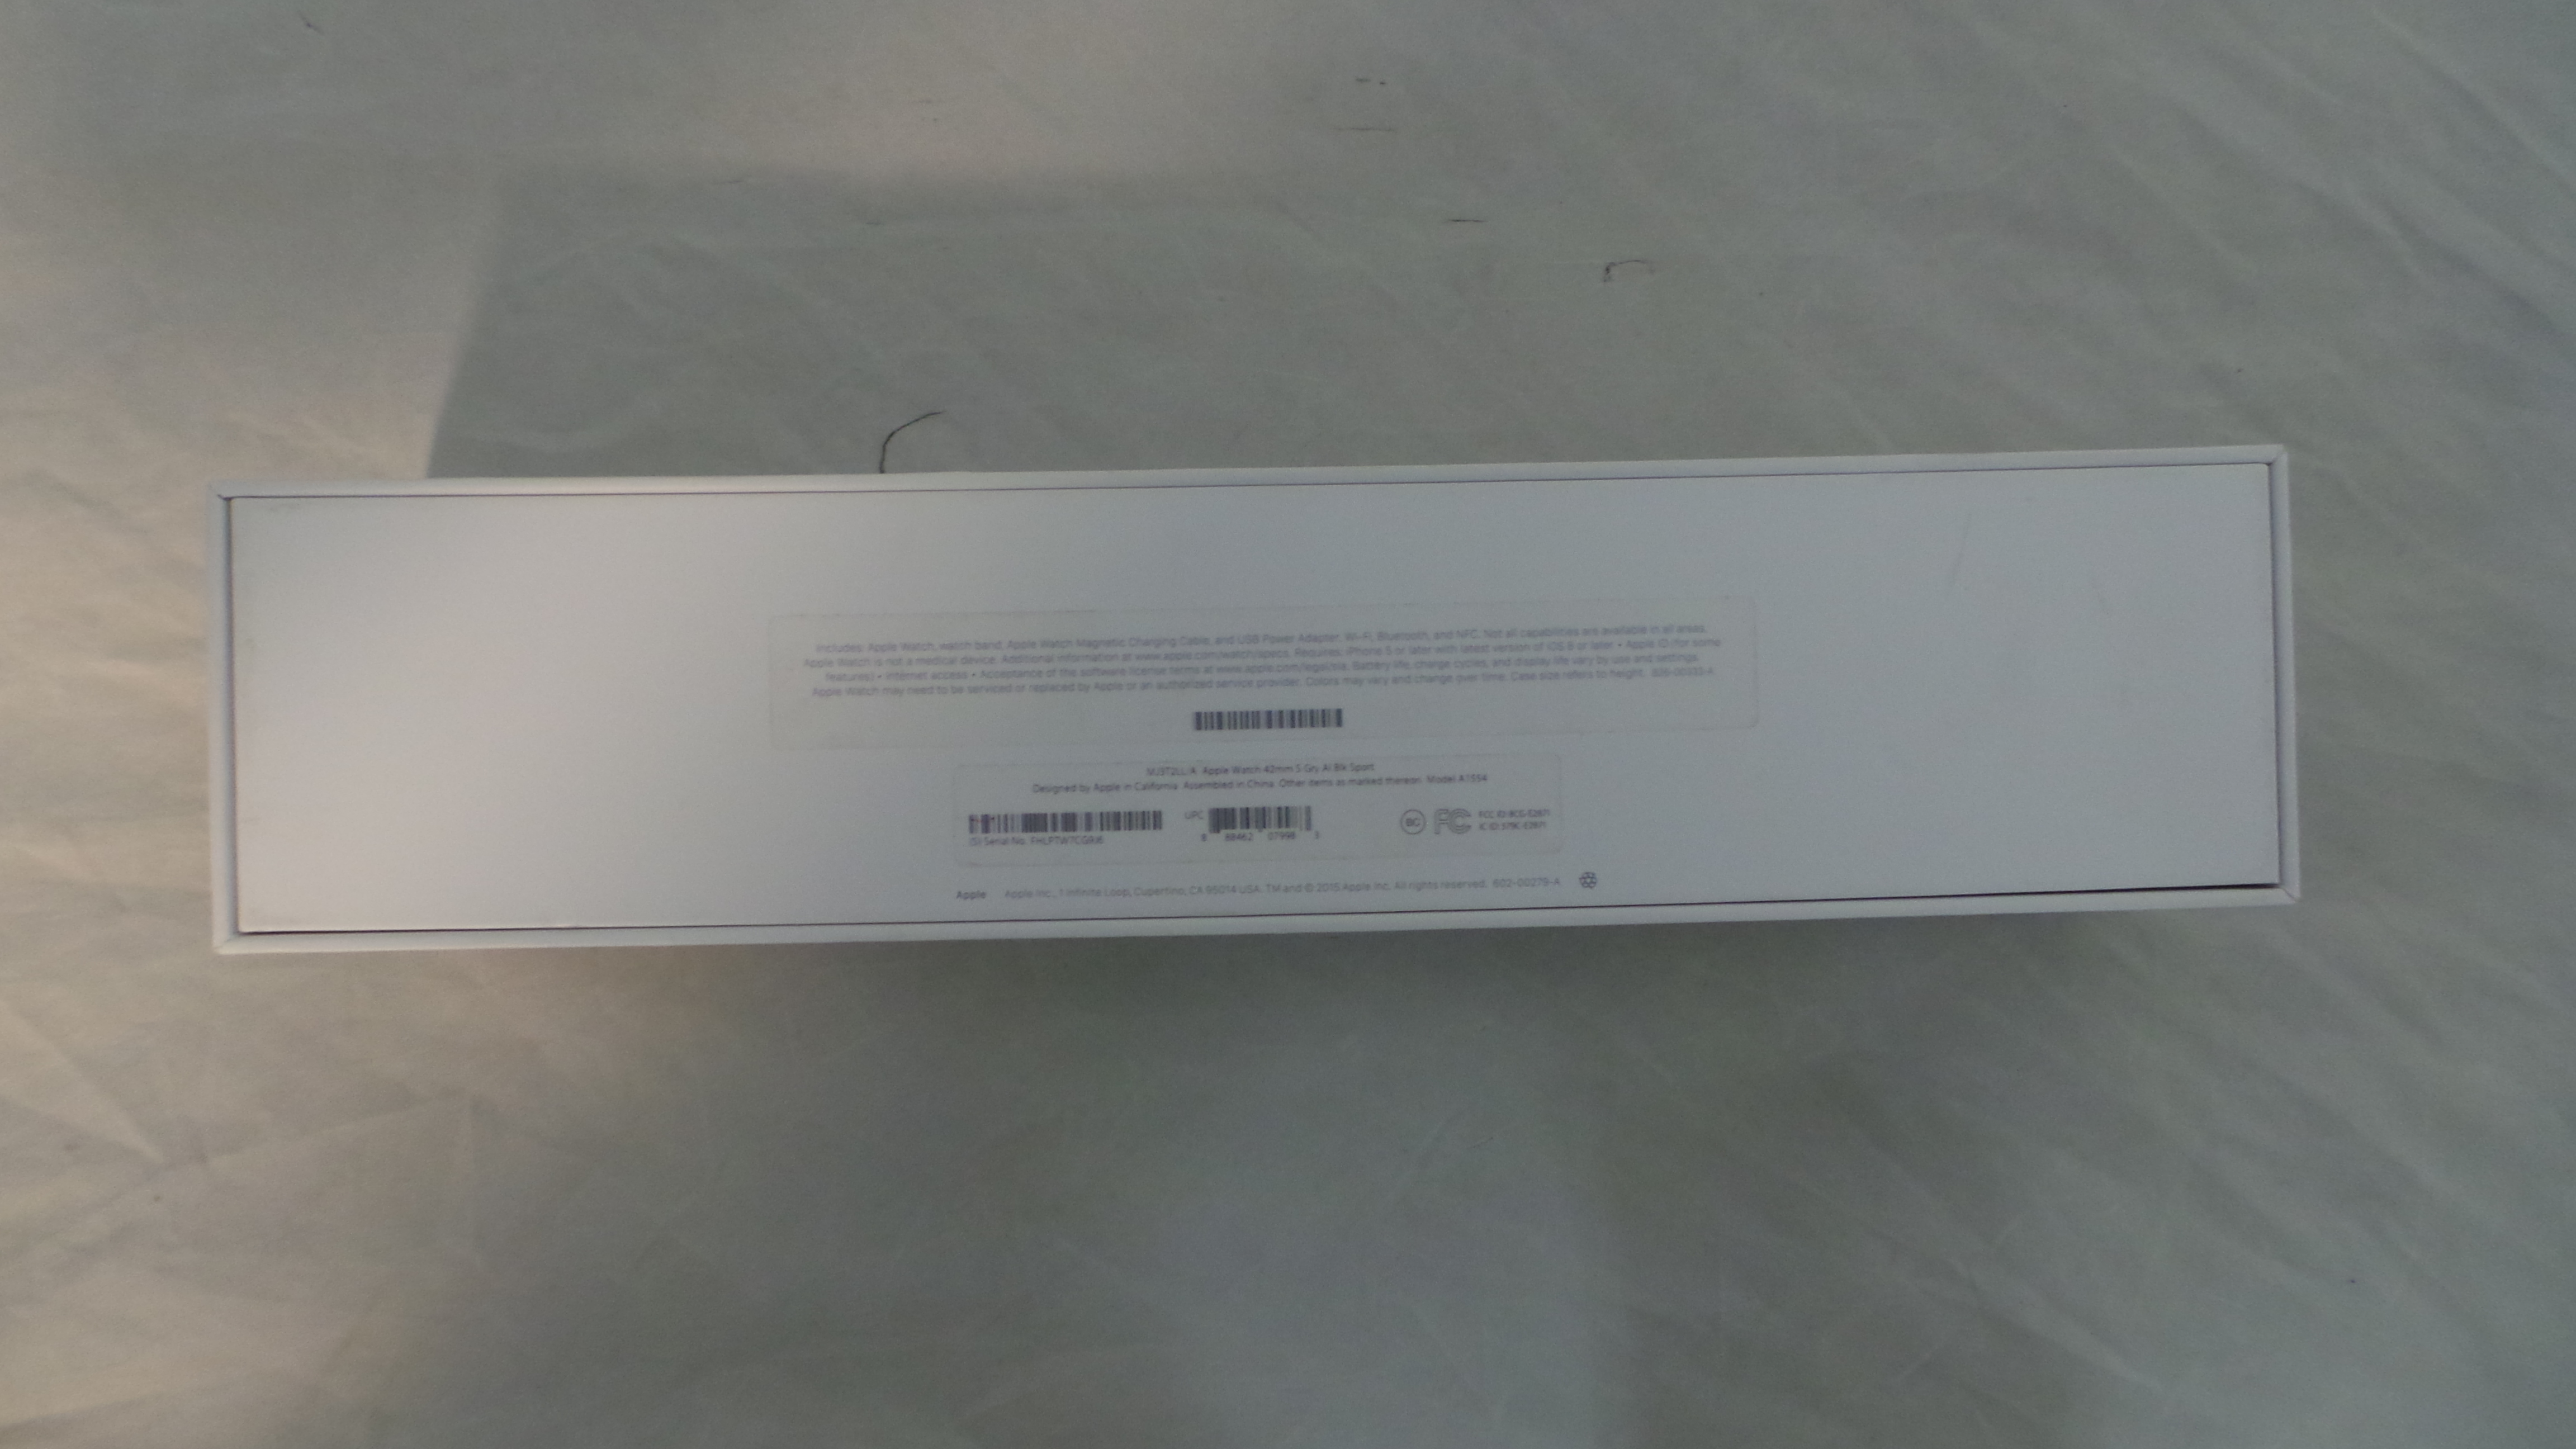 Watch Series 2 Aluminum (42mm), black, Afbeelding 3